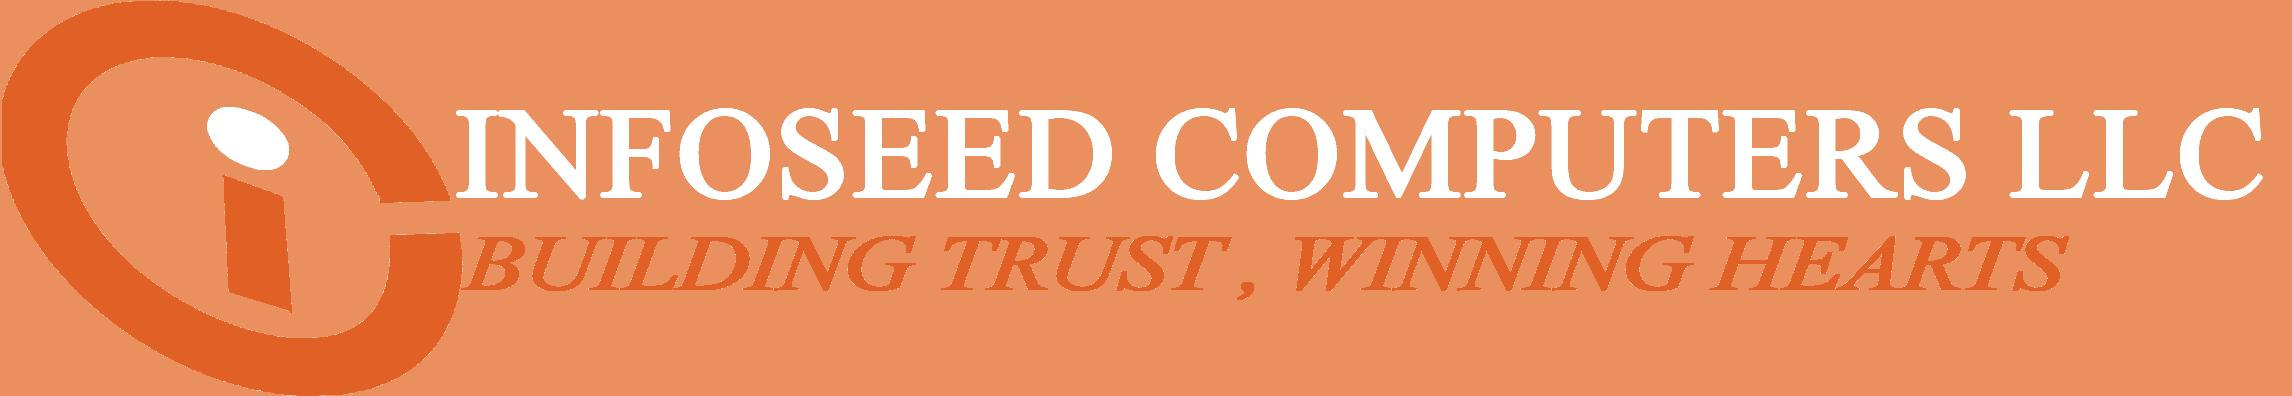 Infoseed Computers